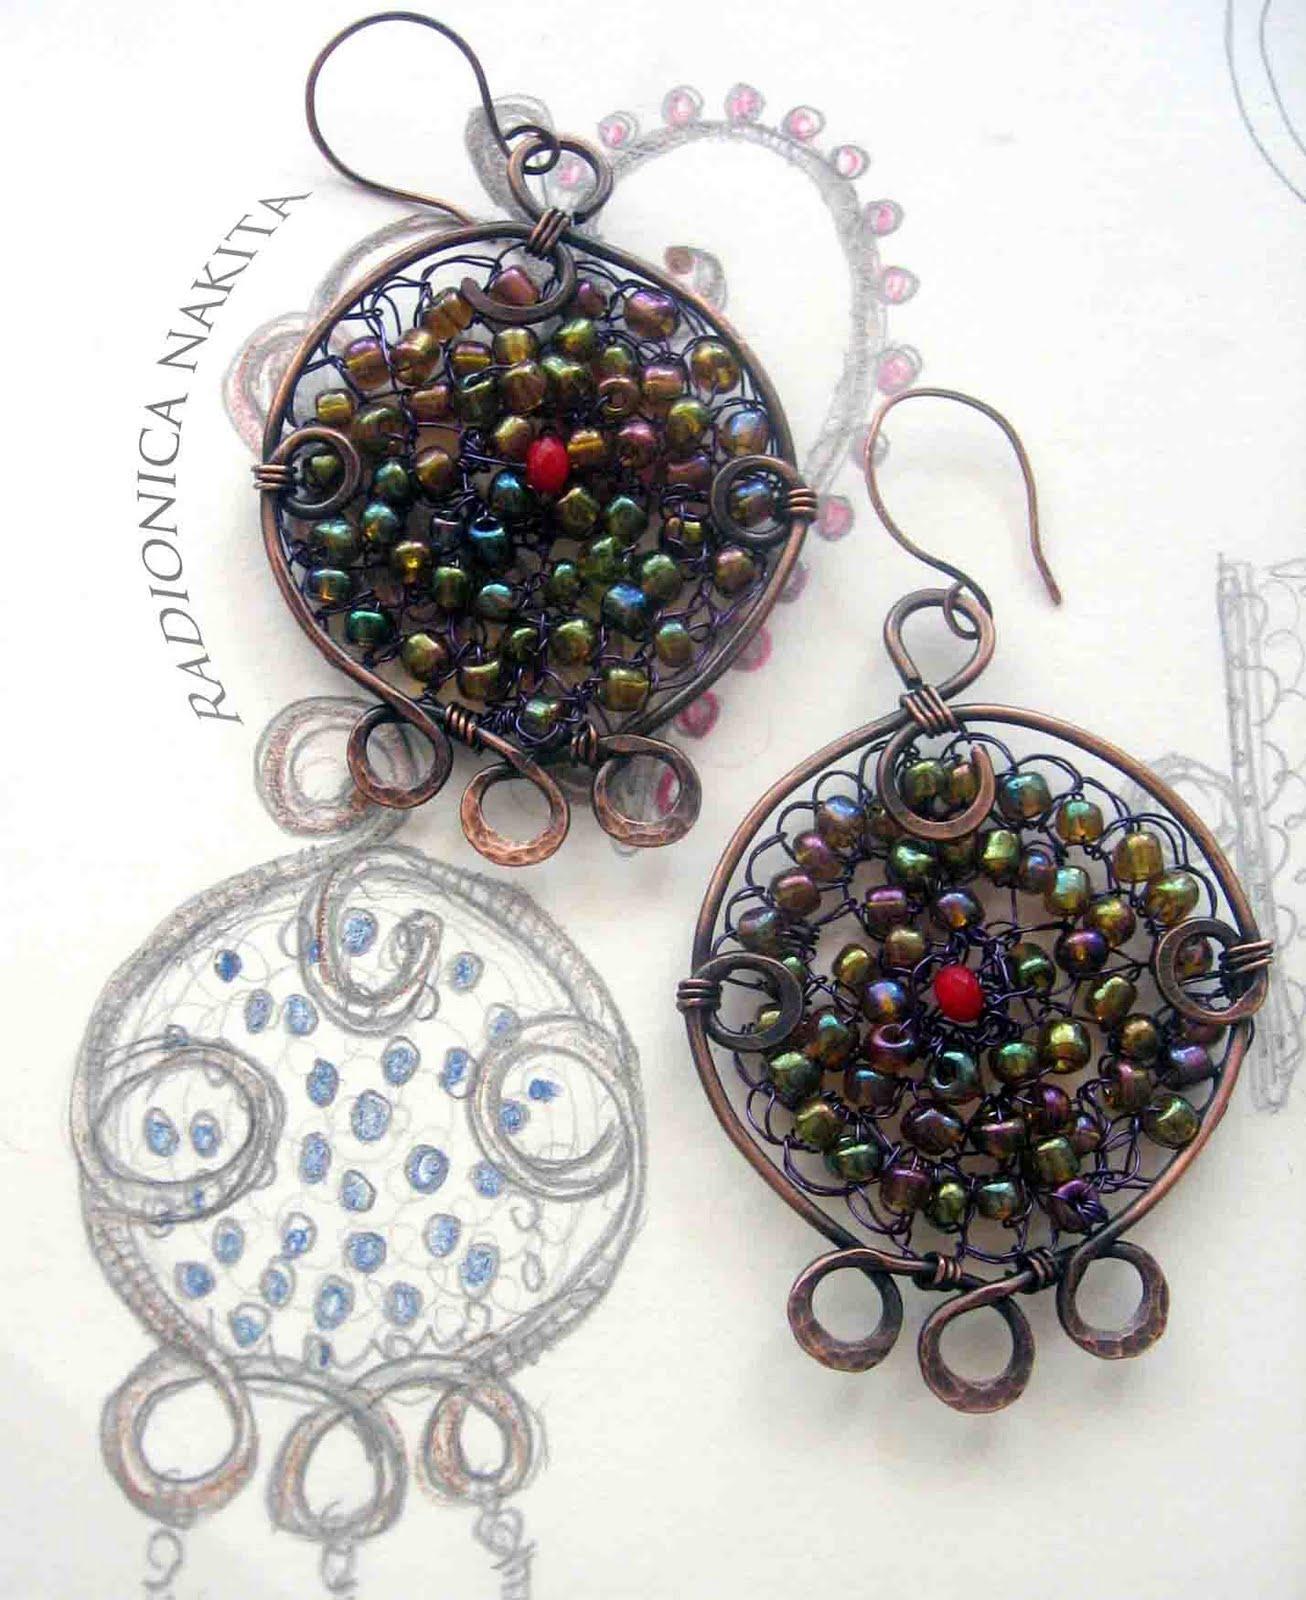 nakit -ukras ili umetnost - Page 5 Nakit+249+copy